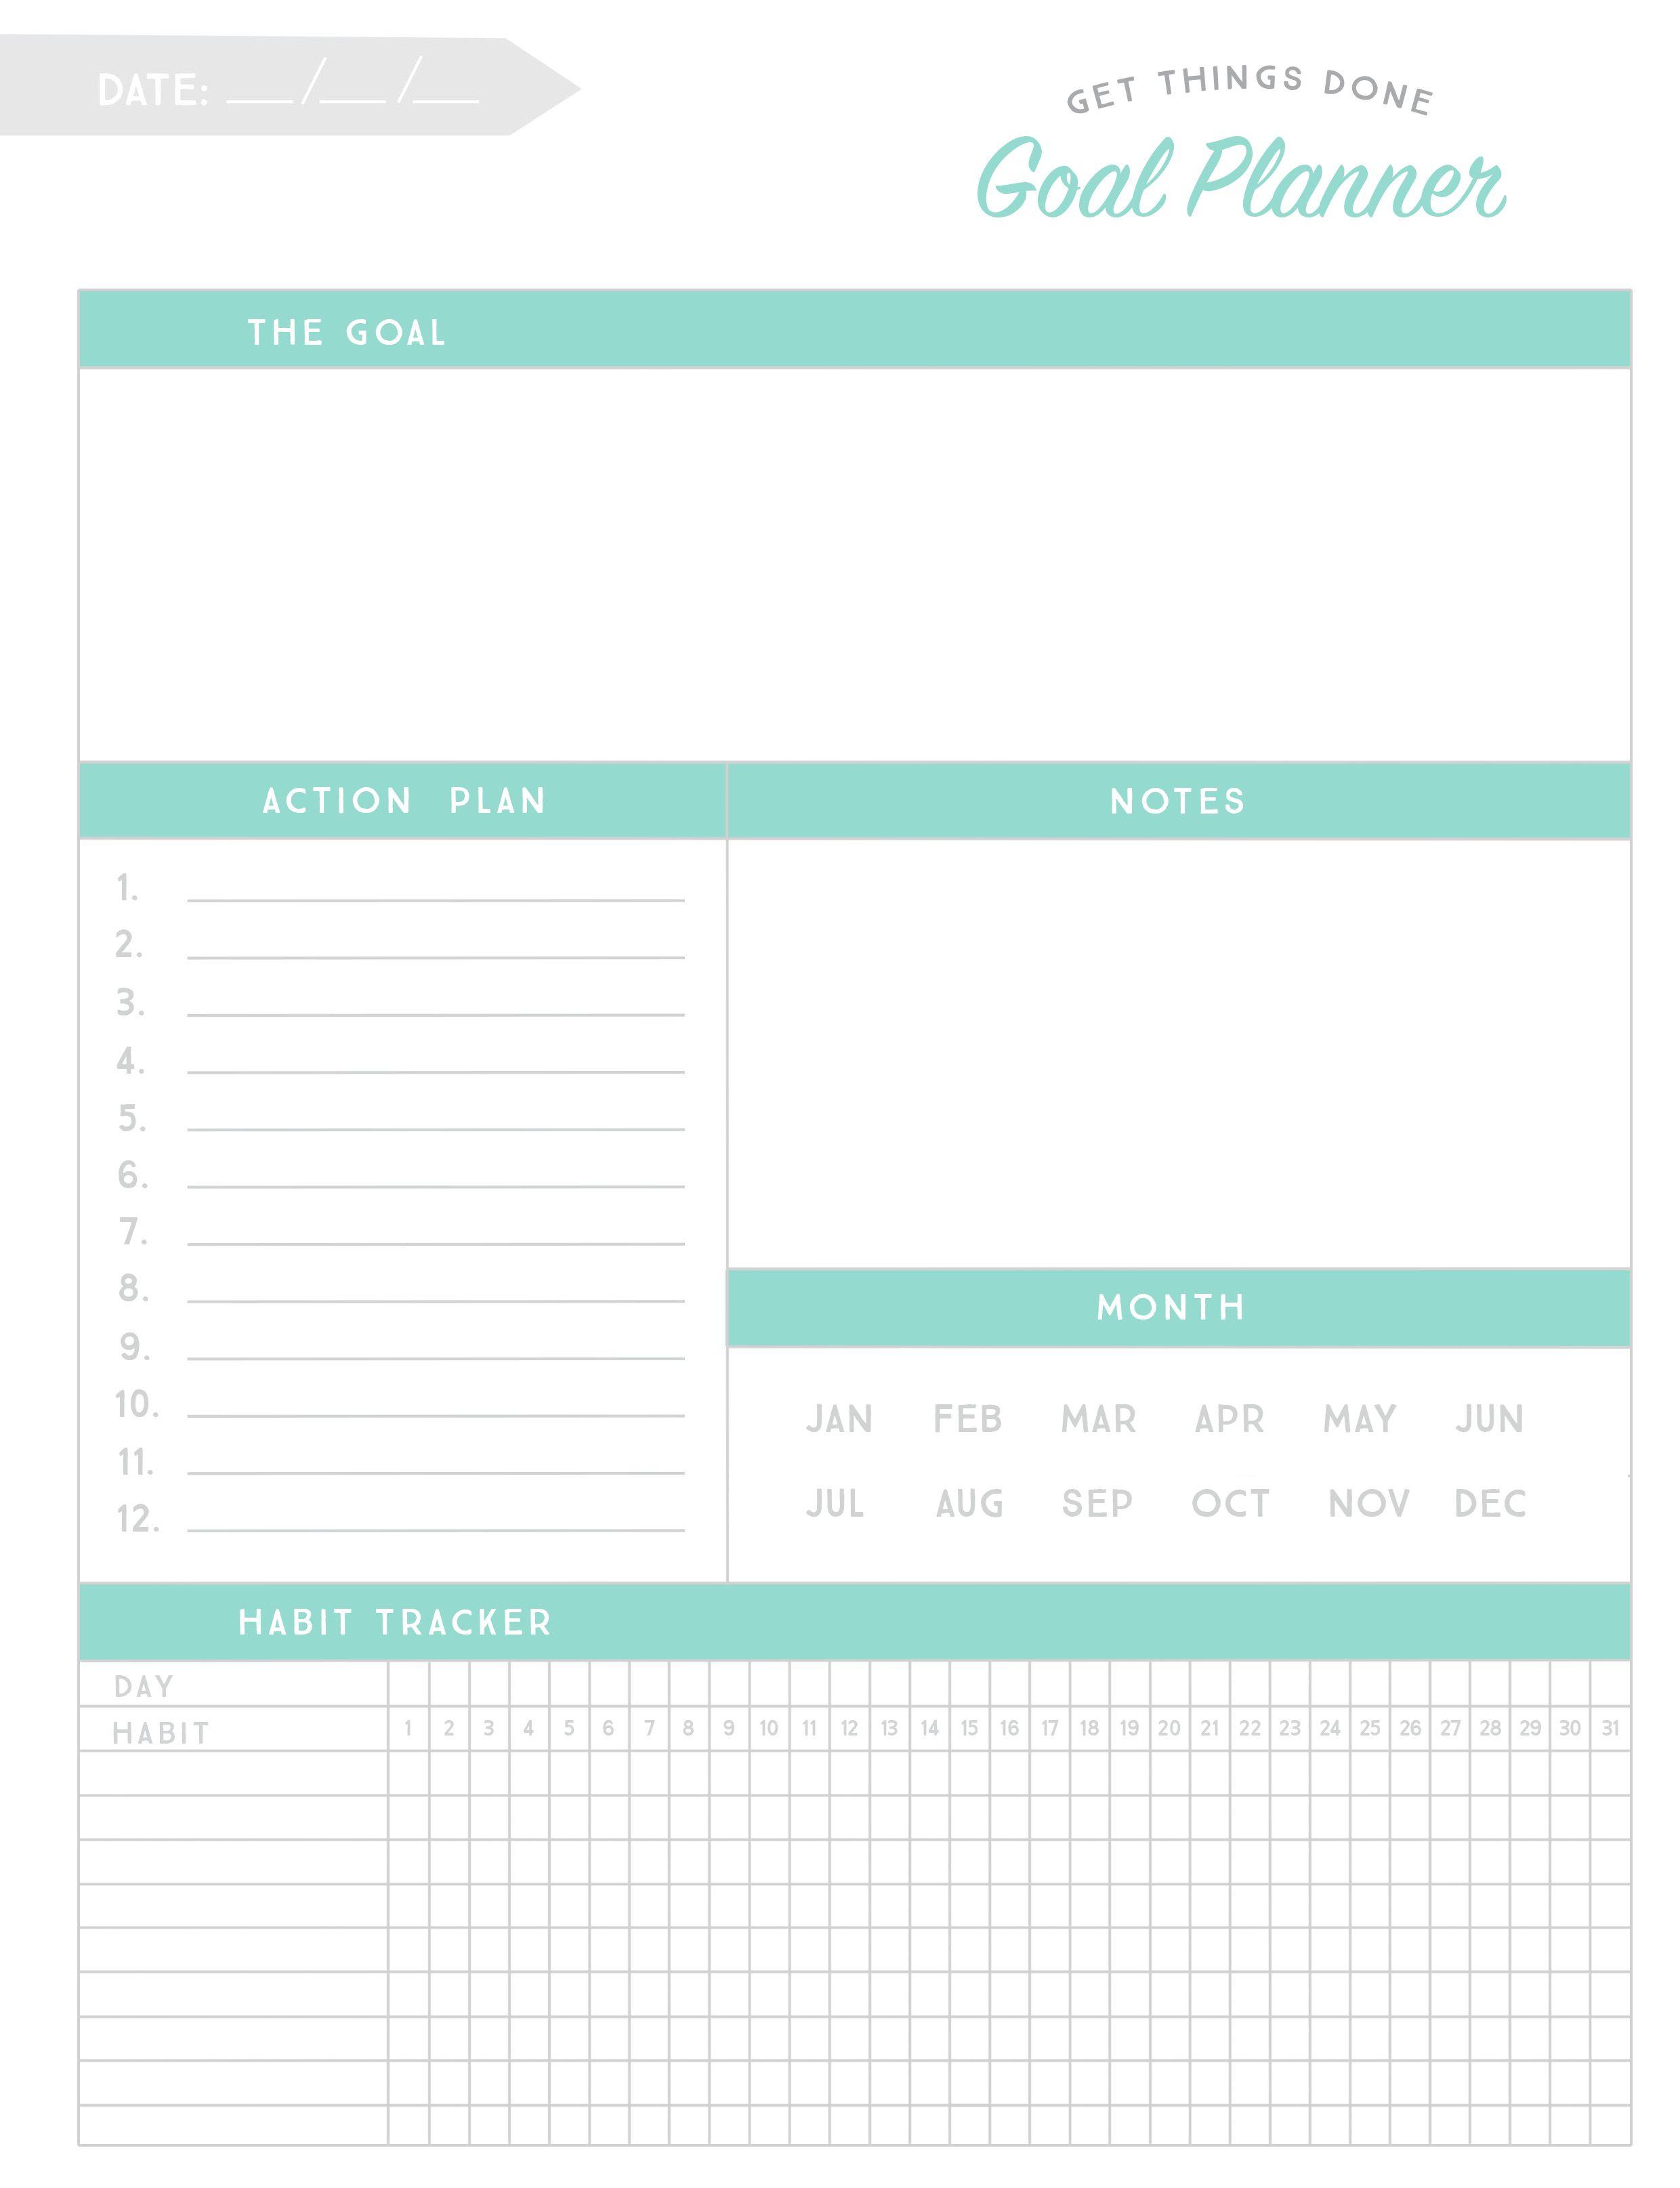 Printable Goal Planner Worksheet